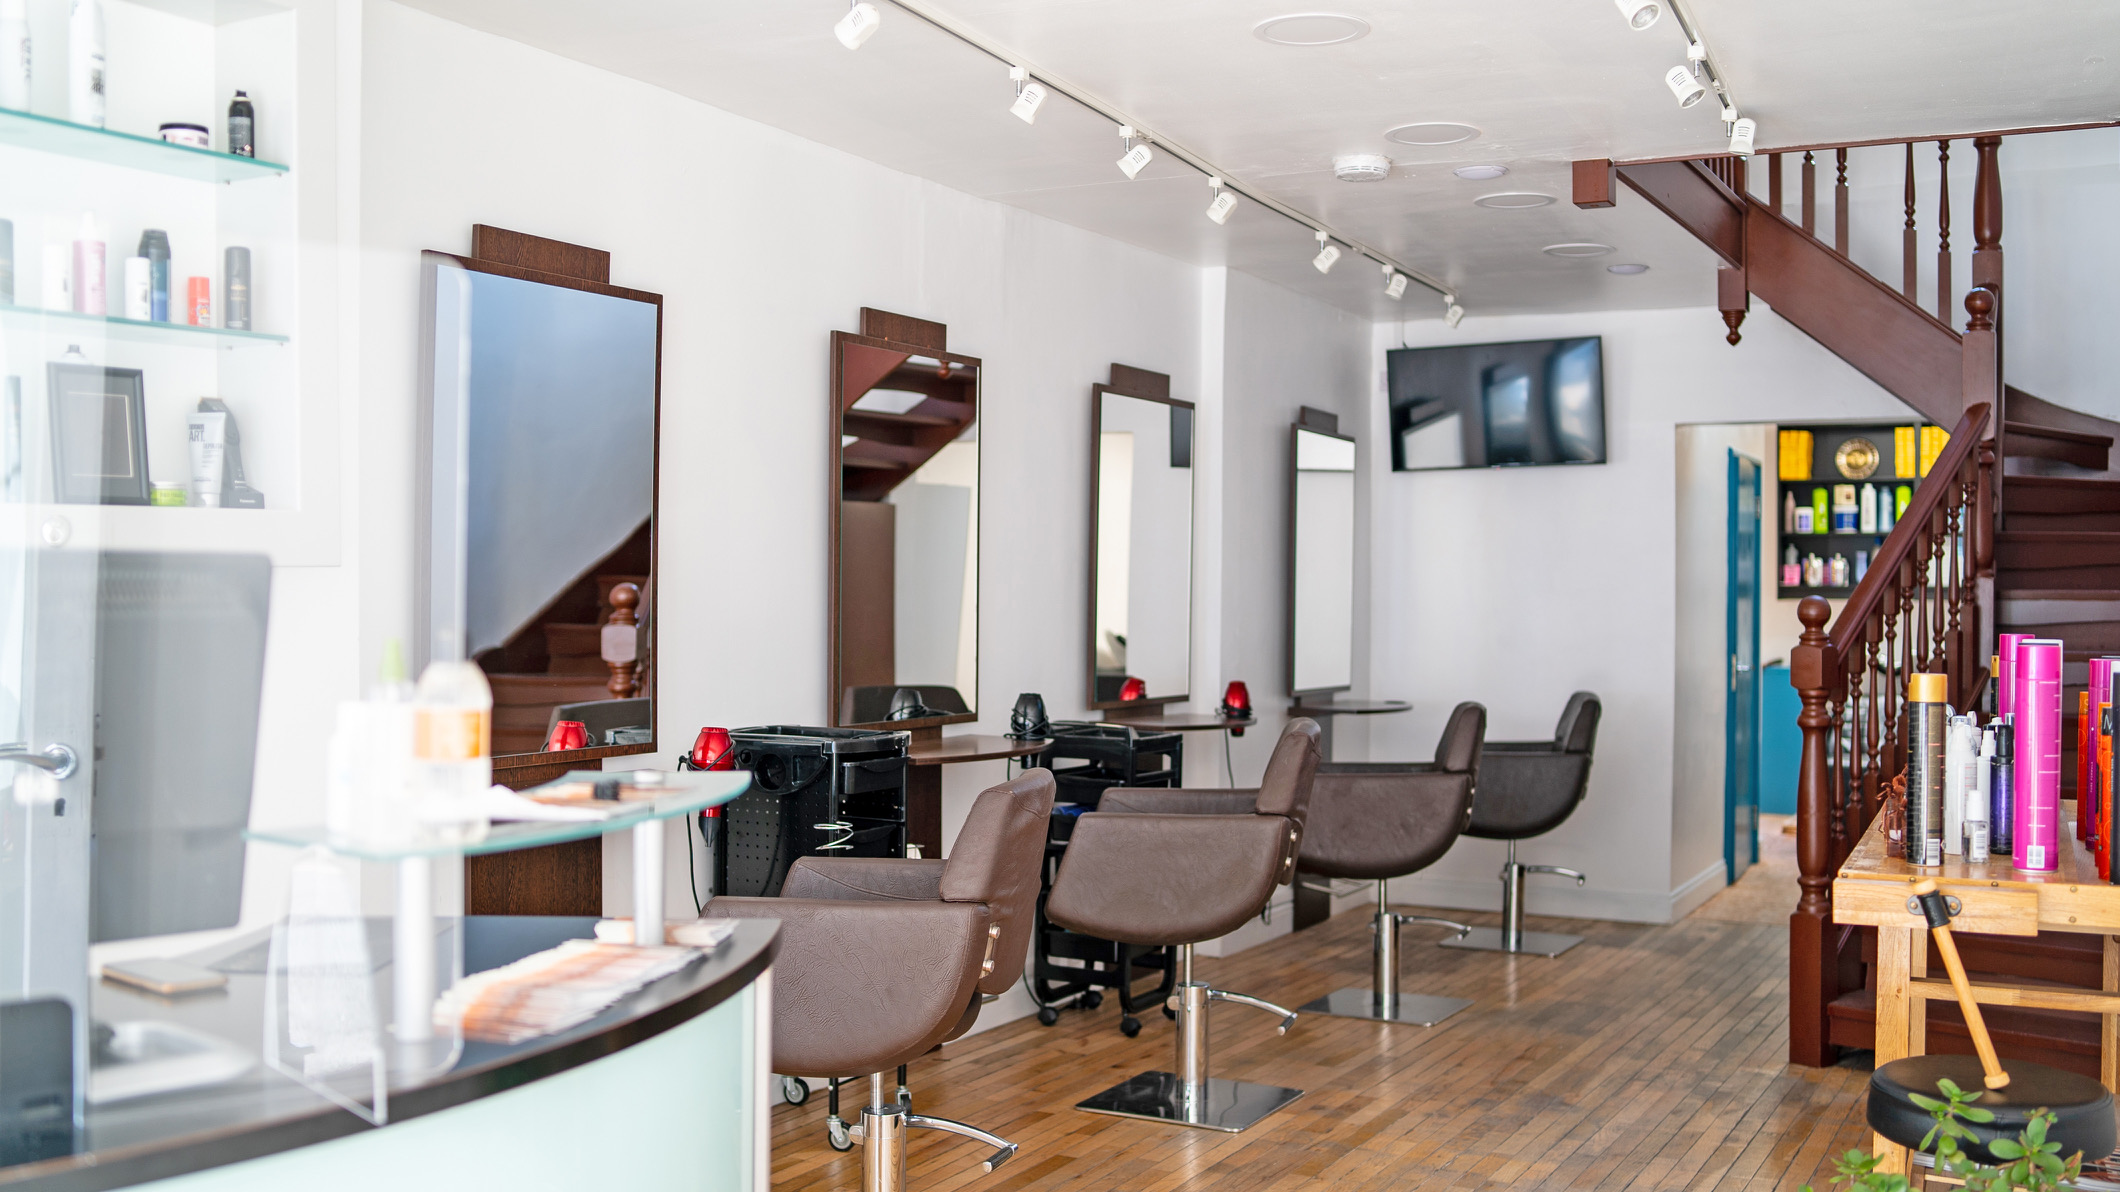 backstage_atelier_hair_salon